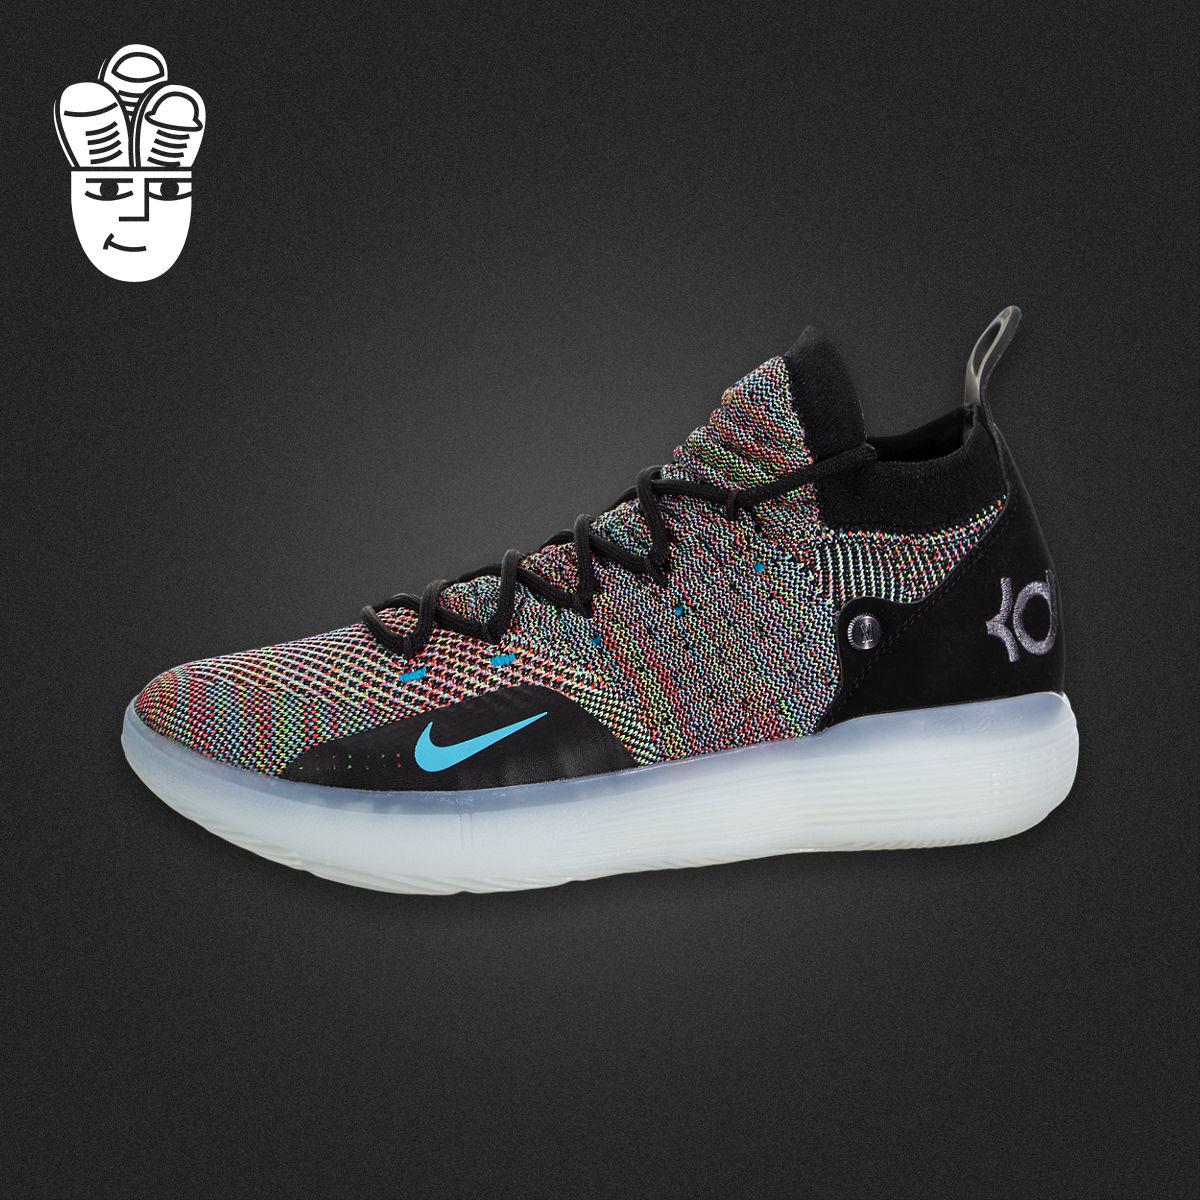 Nike Zoom KD11 耐克篮球鞋 杜兰特11代签名球鞋 稳定保护缓震